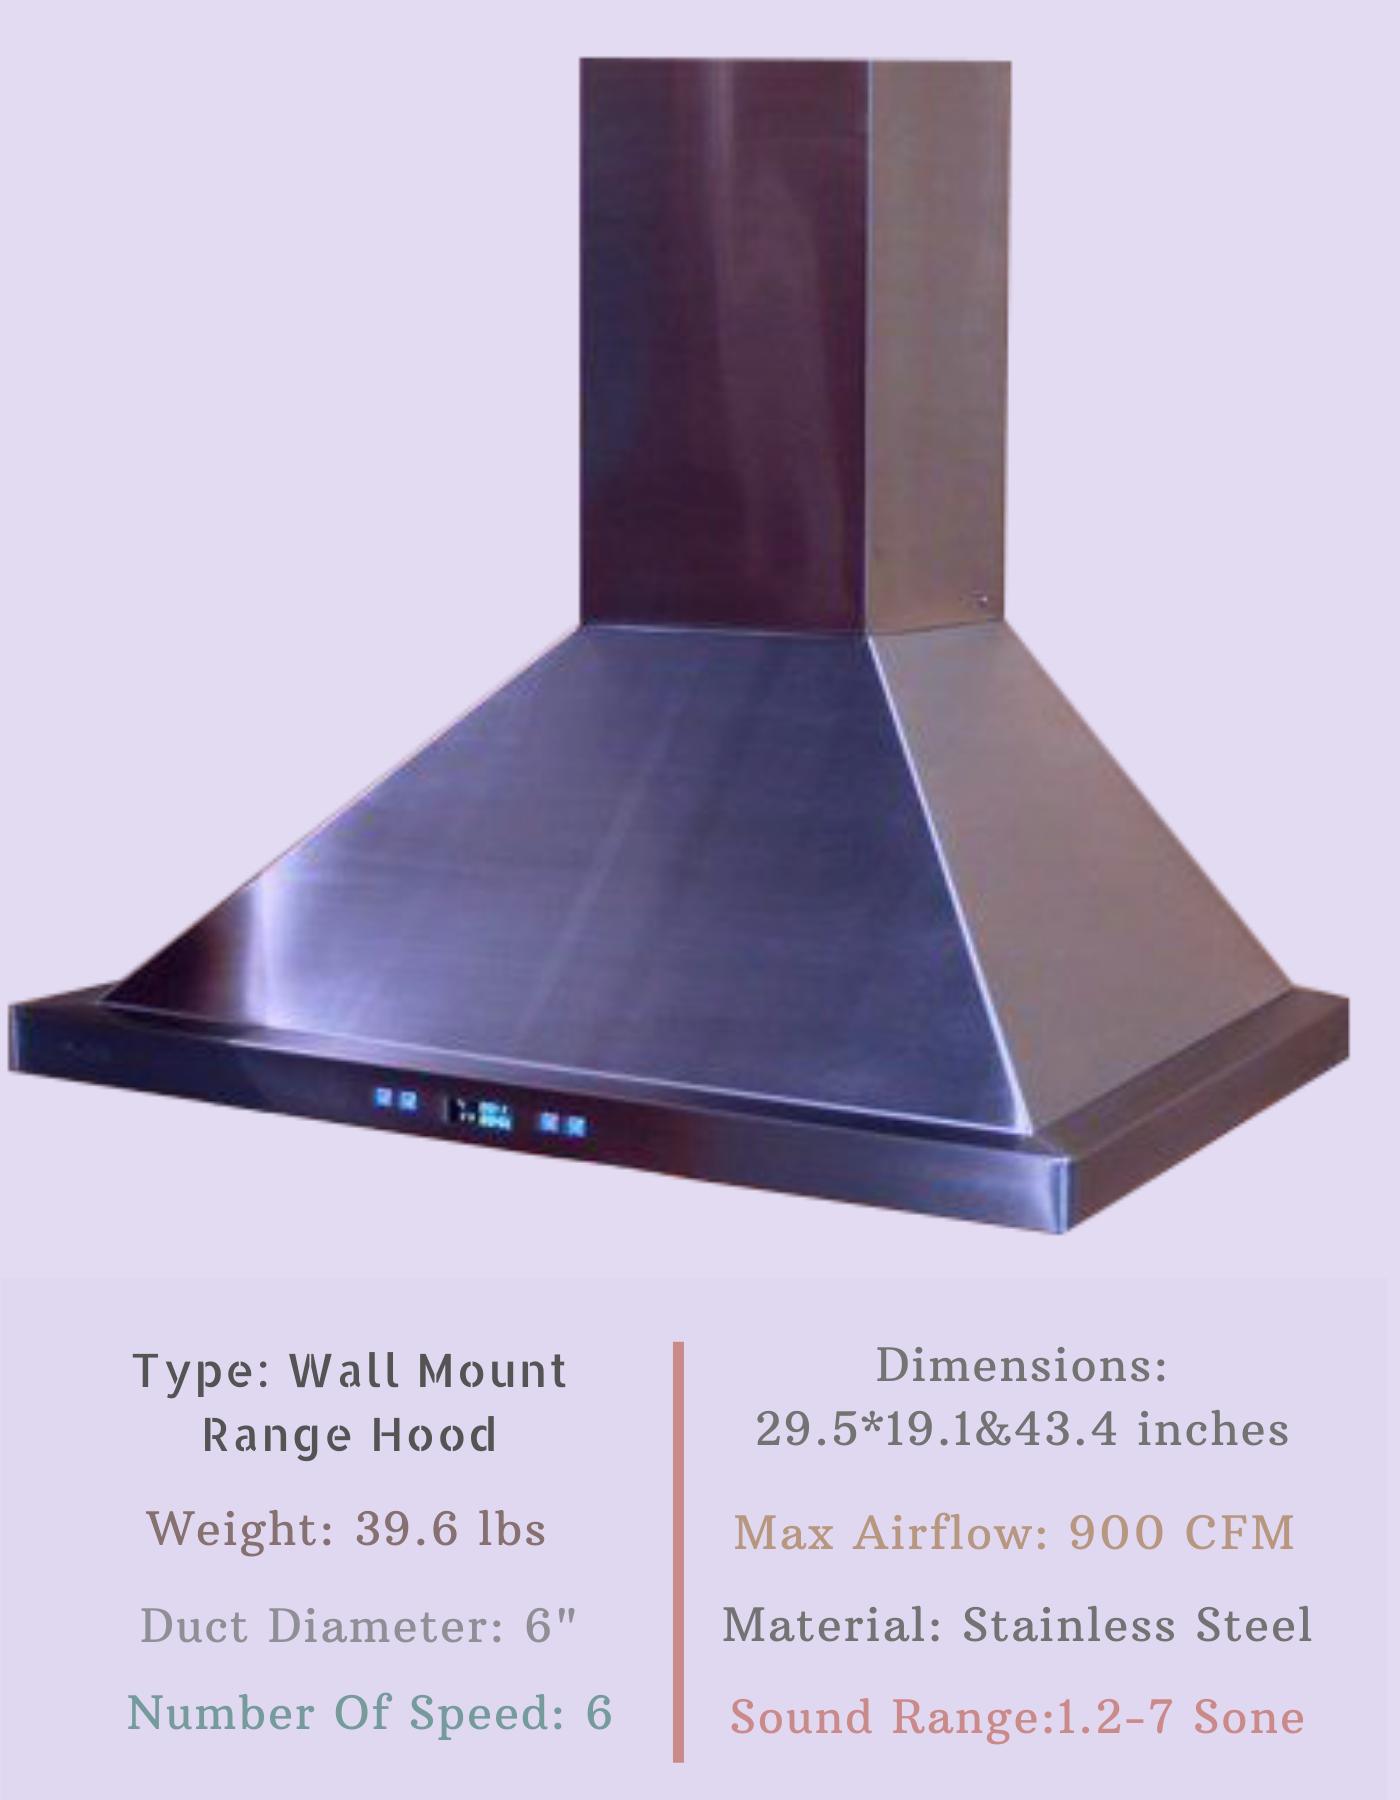 Cavaliere Sv218b2 30 Wall Mount Range Hood Wall Mount Range Hood Range Hood How To Clean Metal